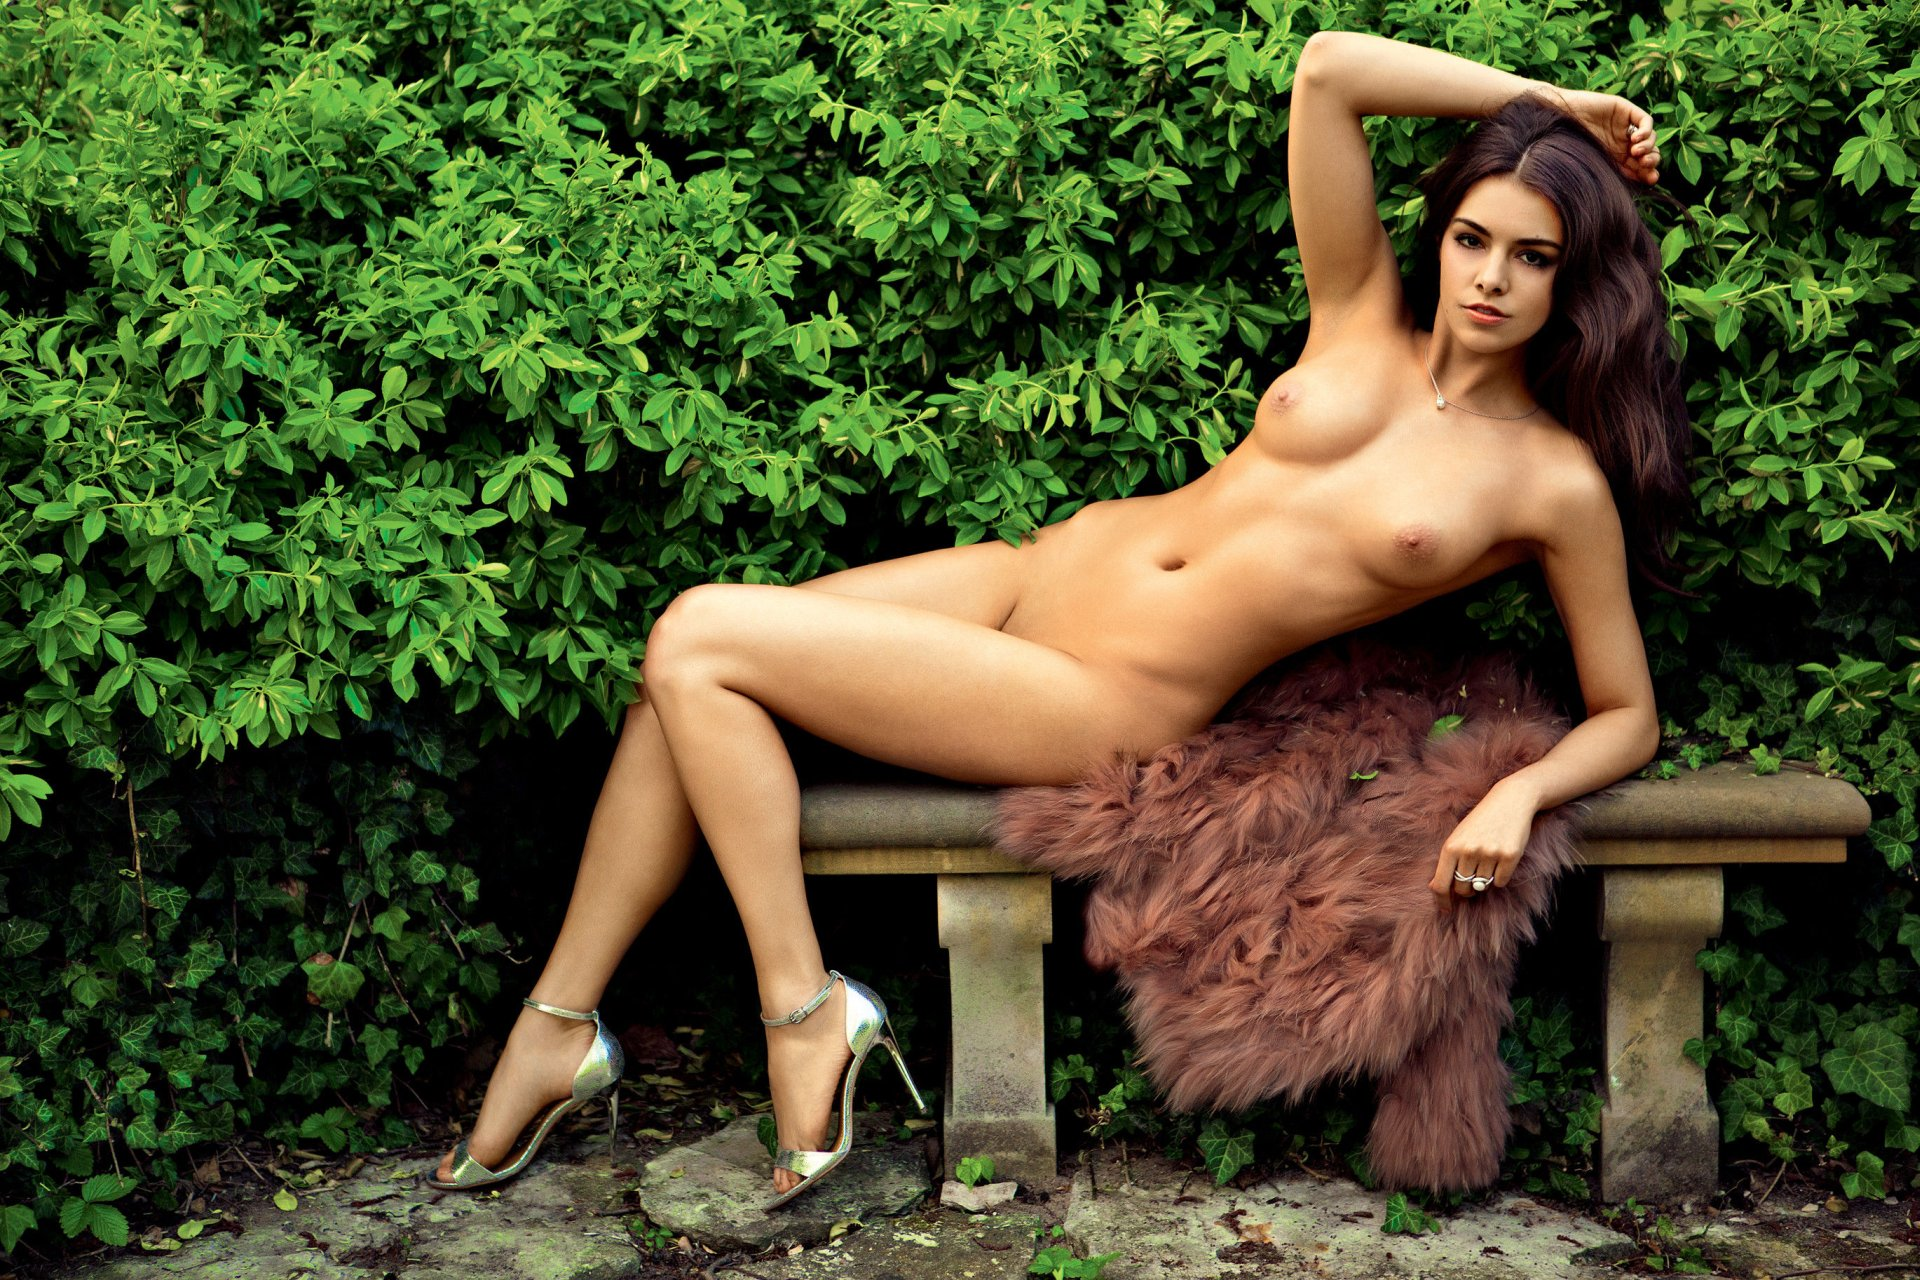 Anita sikorska nude sexy 27 Photos